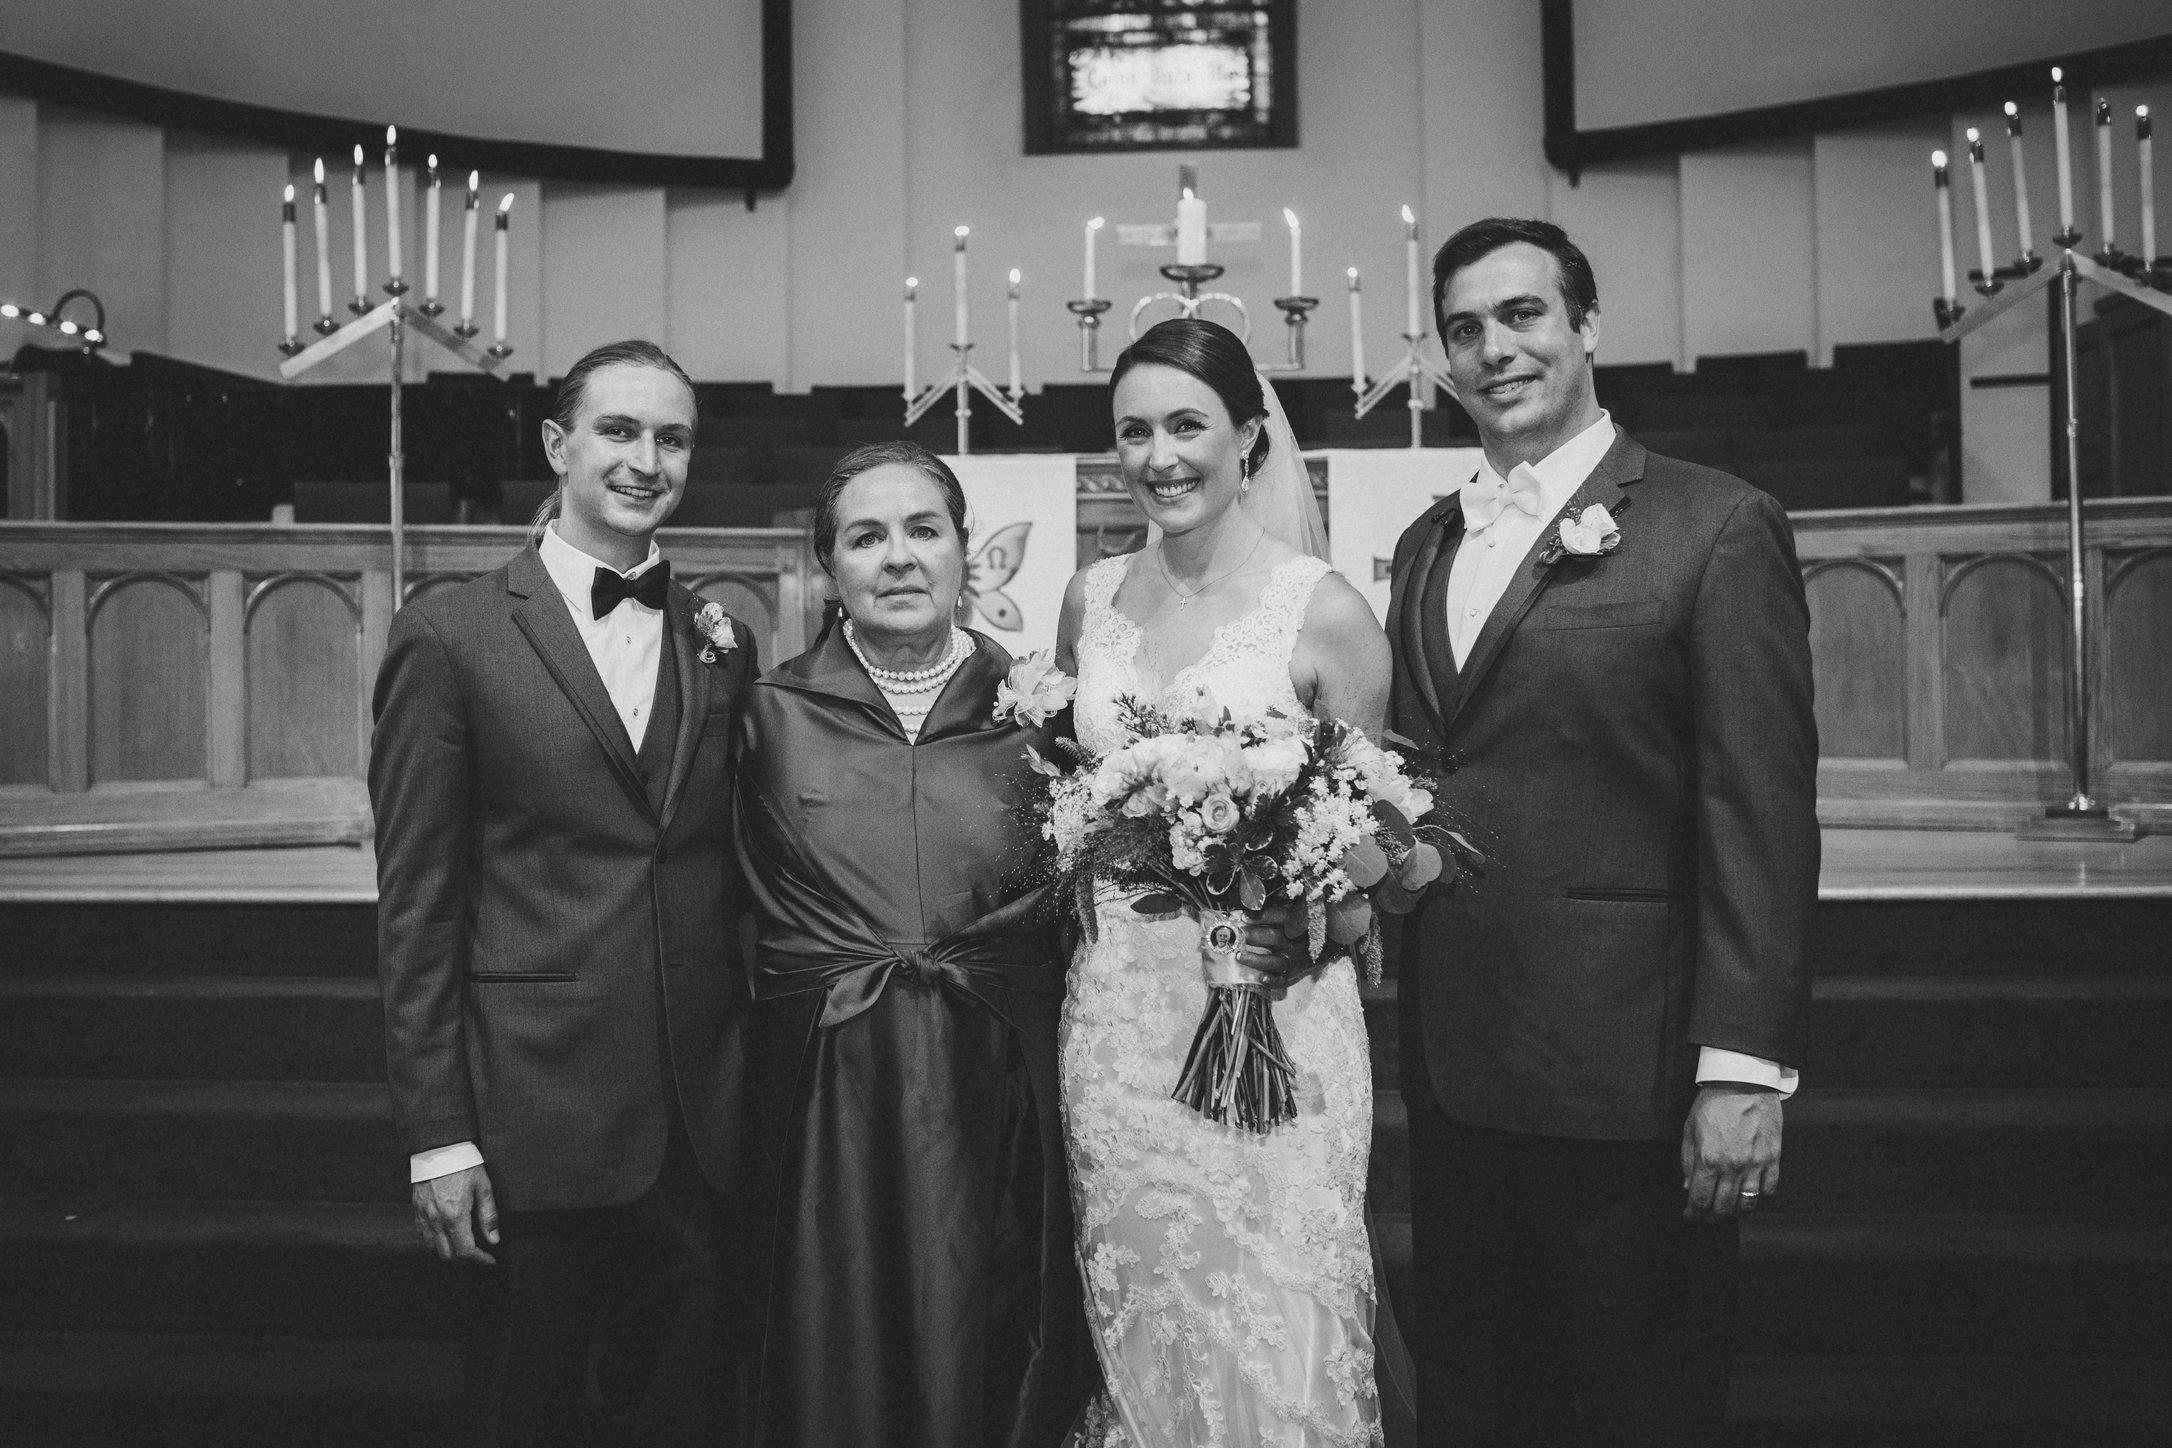 SandC-wedding-265.jpg